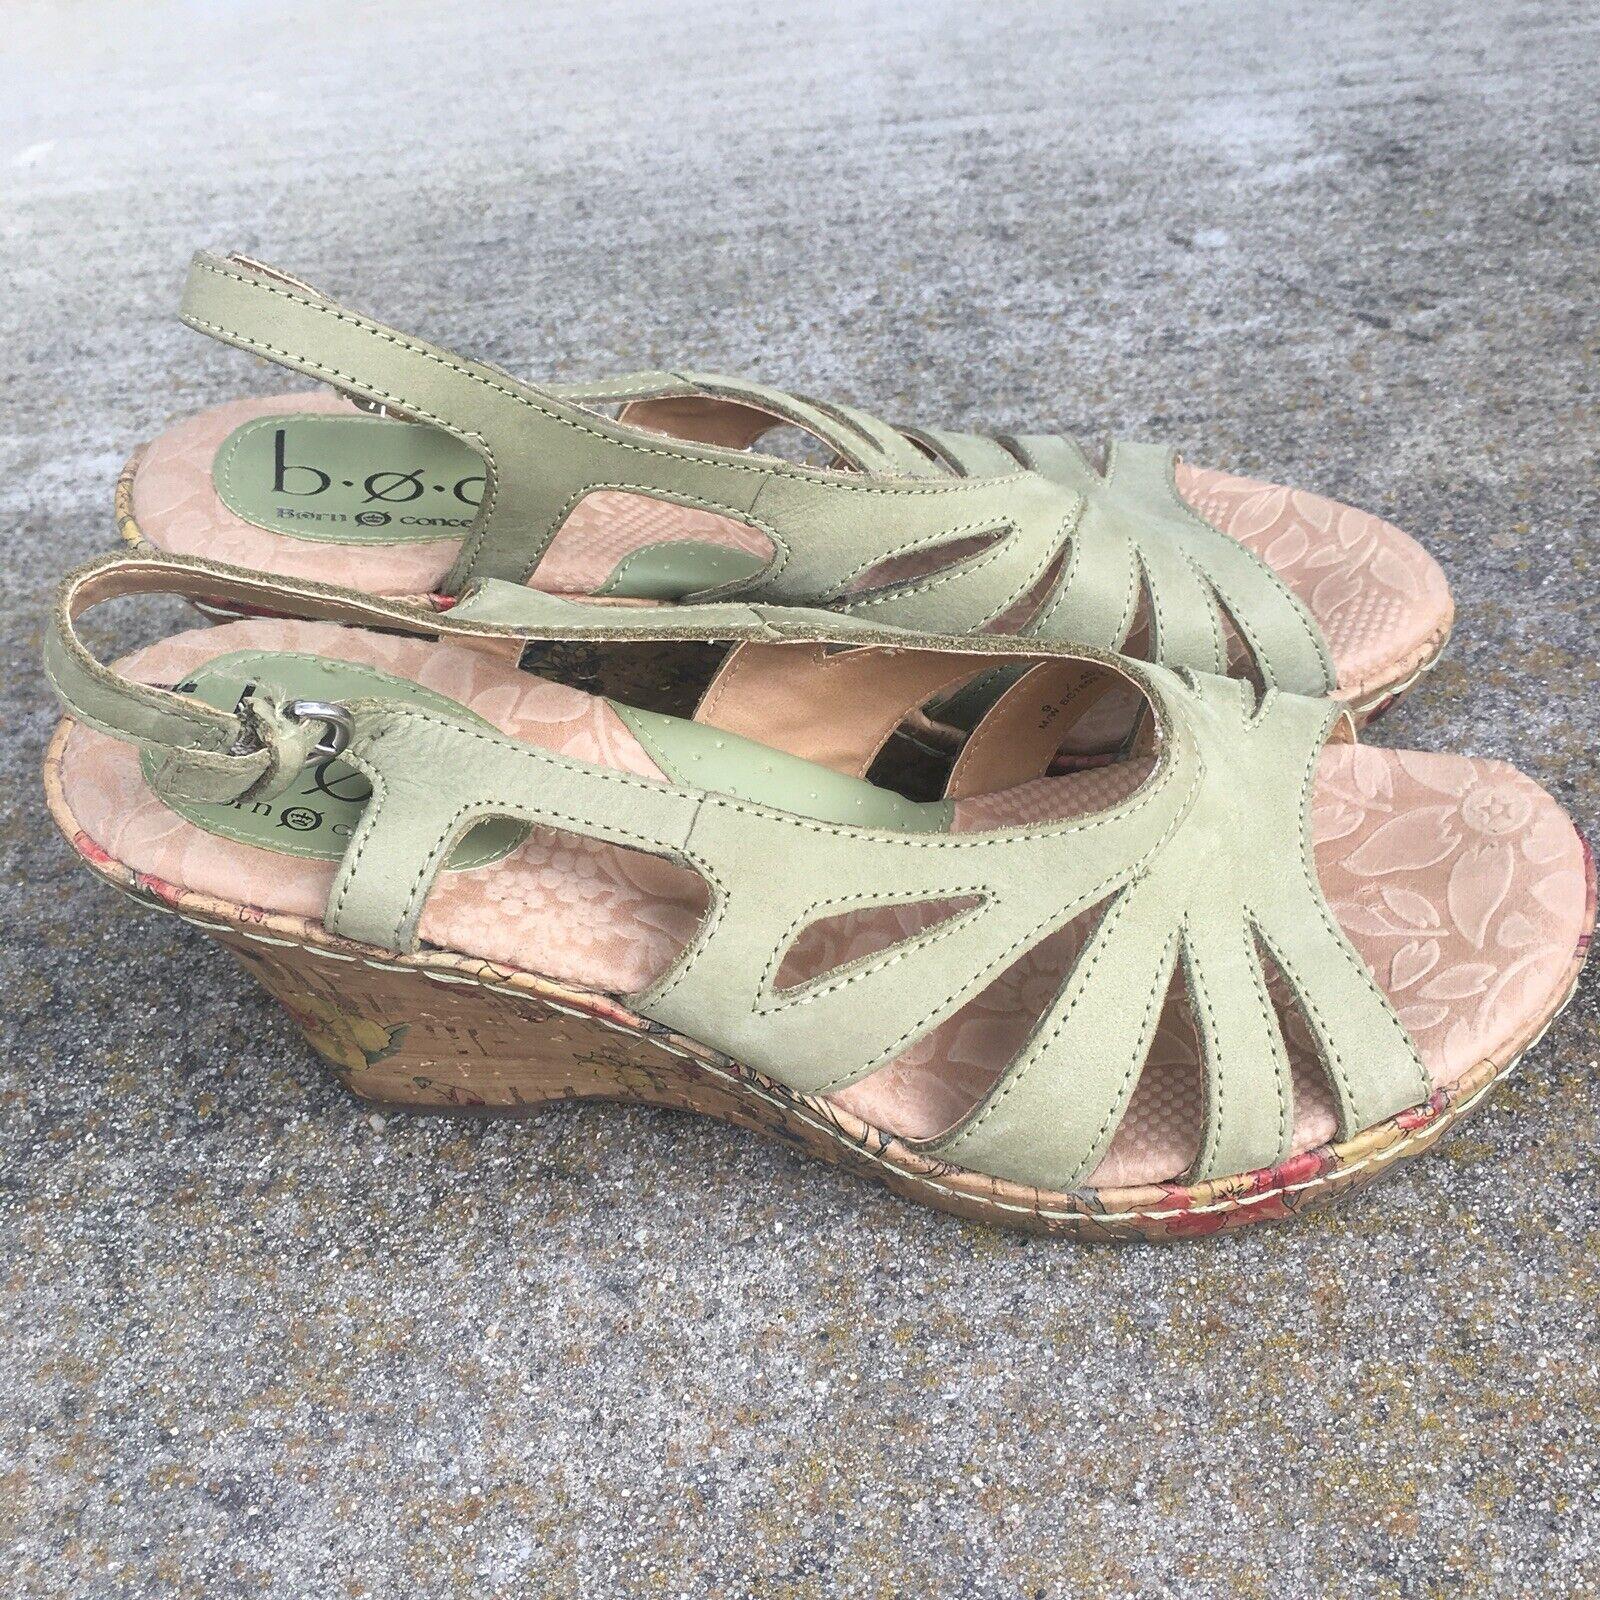 BOC BORN Women Mint Green Leather Wedge 3.5  Strap Sling Back Sandal shoes Sz 9